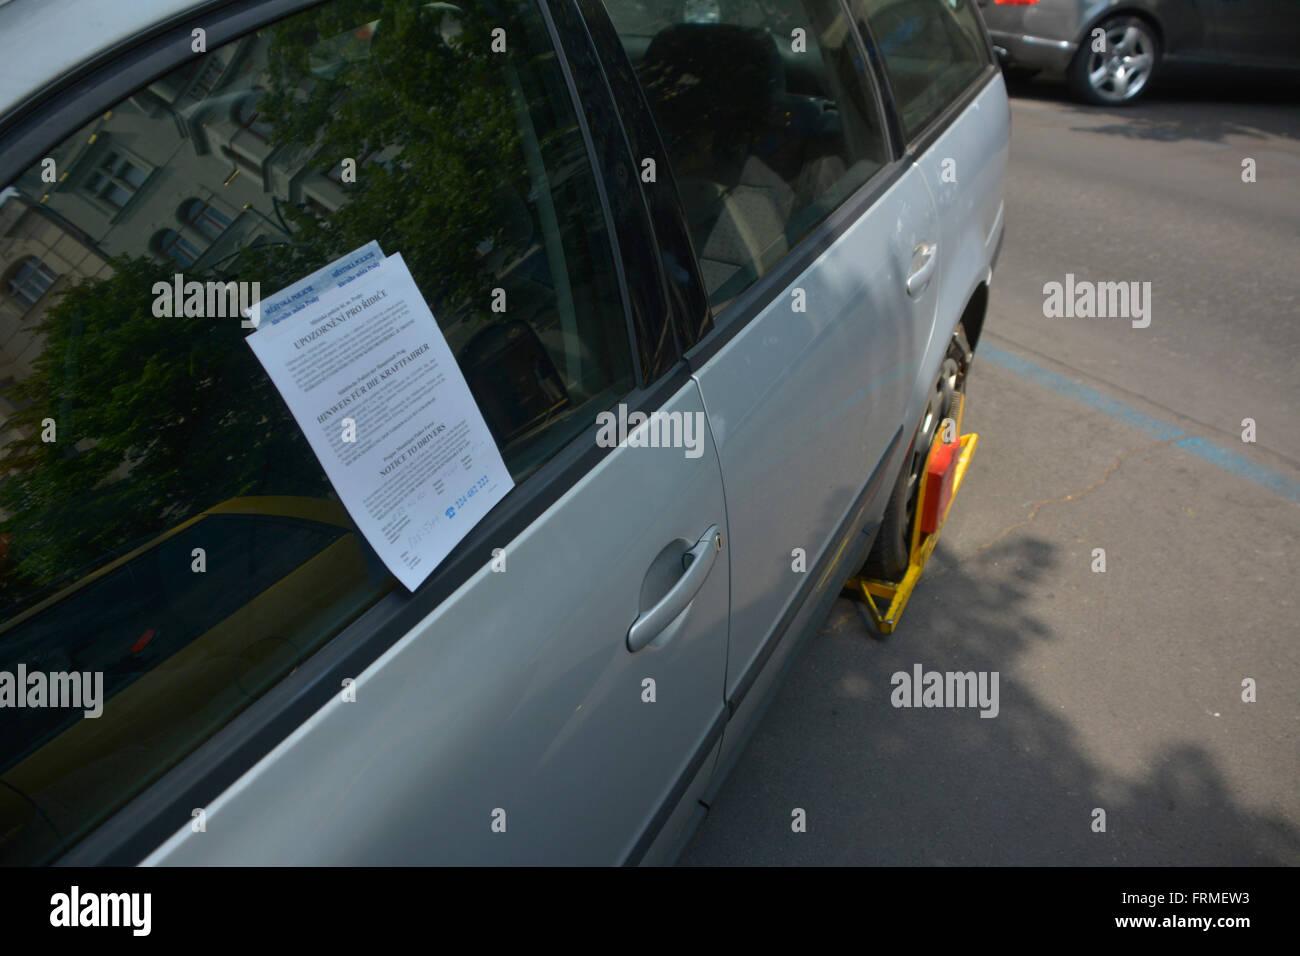 Parking Violation ticket in Prague, Czech - Stock Image